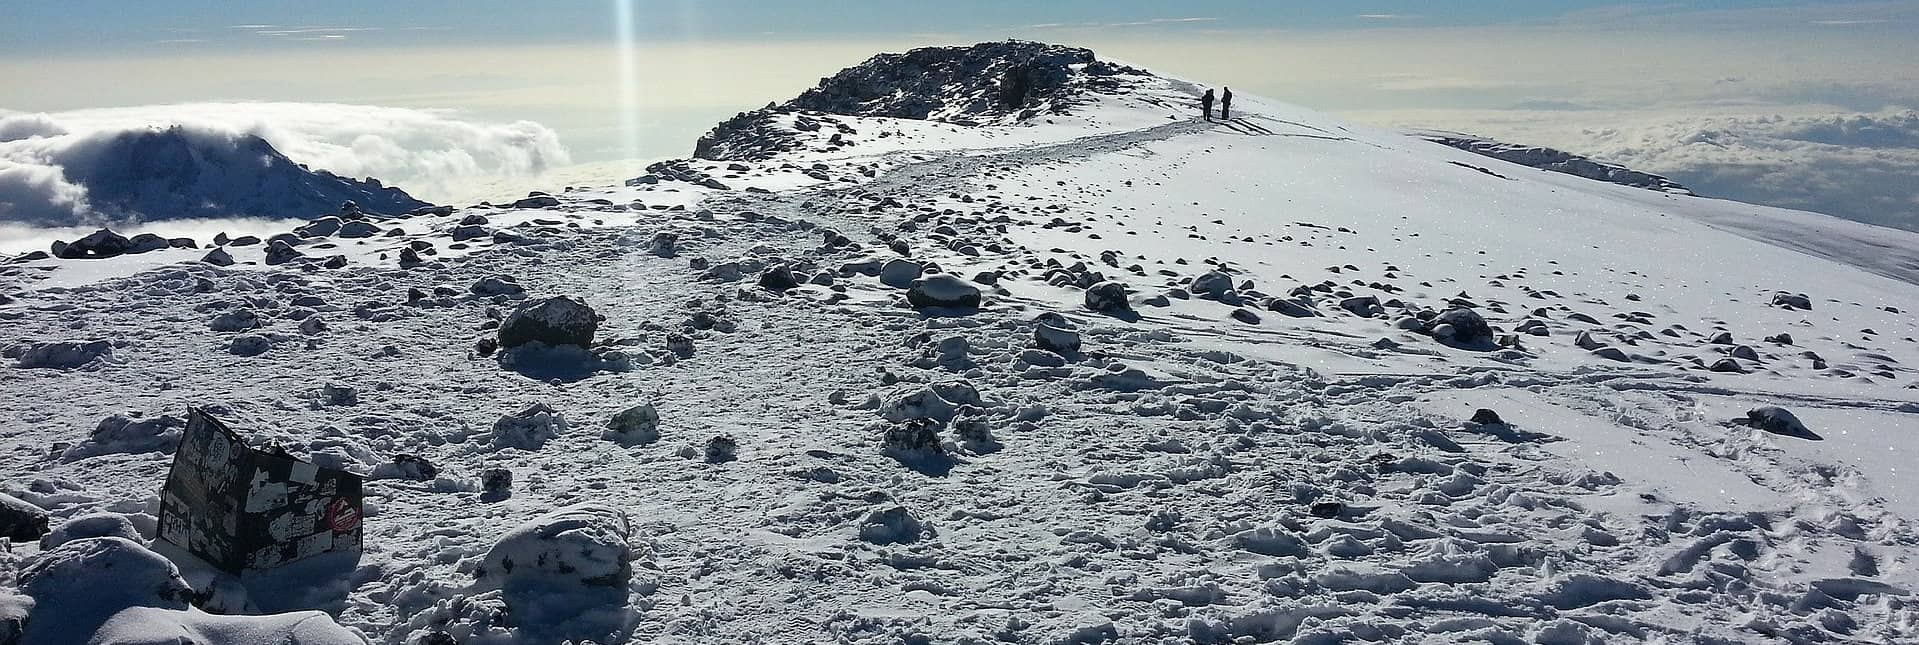 Cume do Kilimanjaro, O Teto de África!, Tanzânia